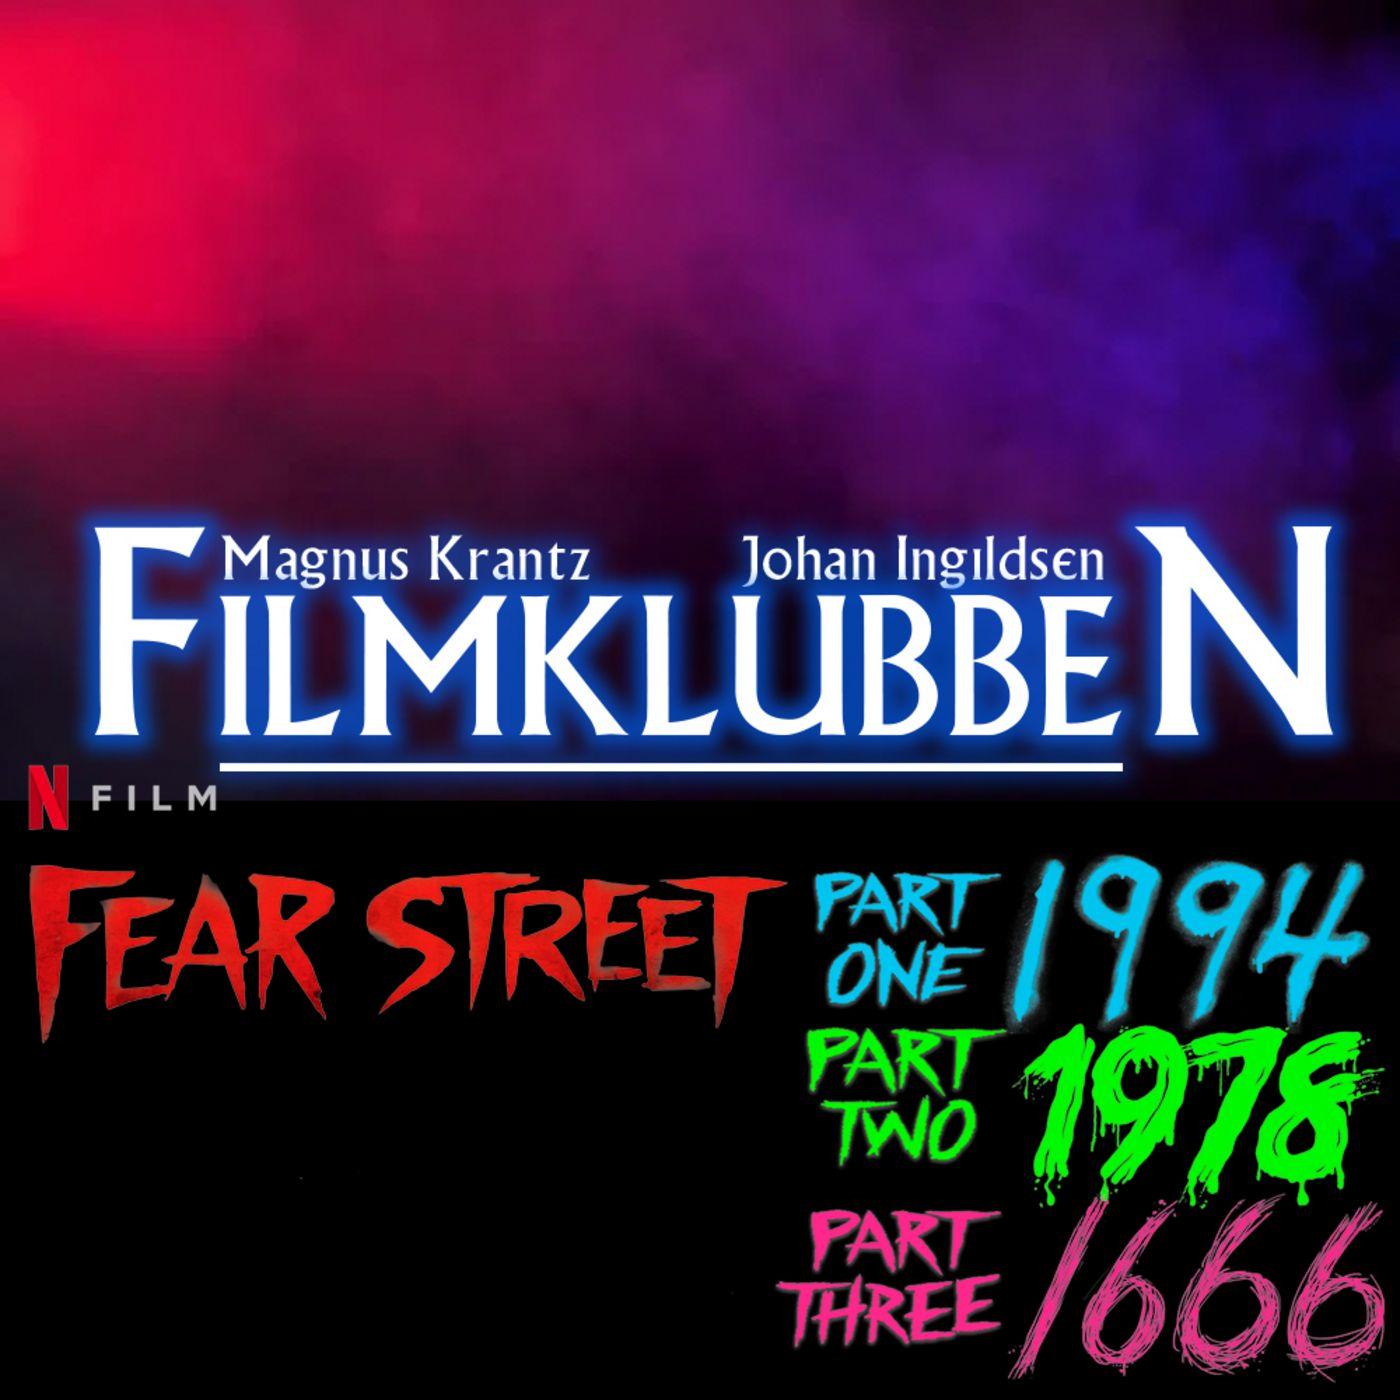 Fear street : Part 1, 2 & 3 (2021)